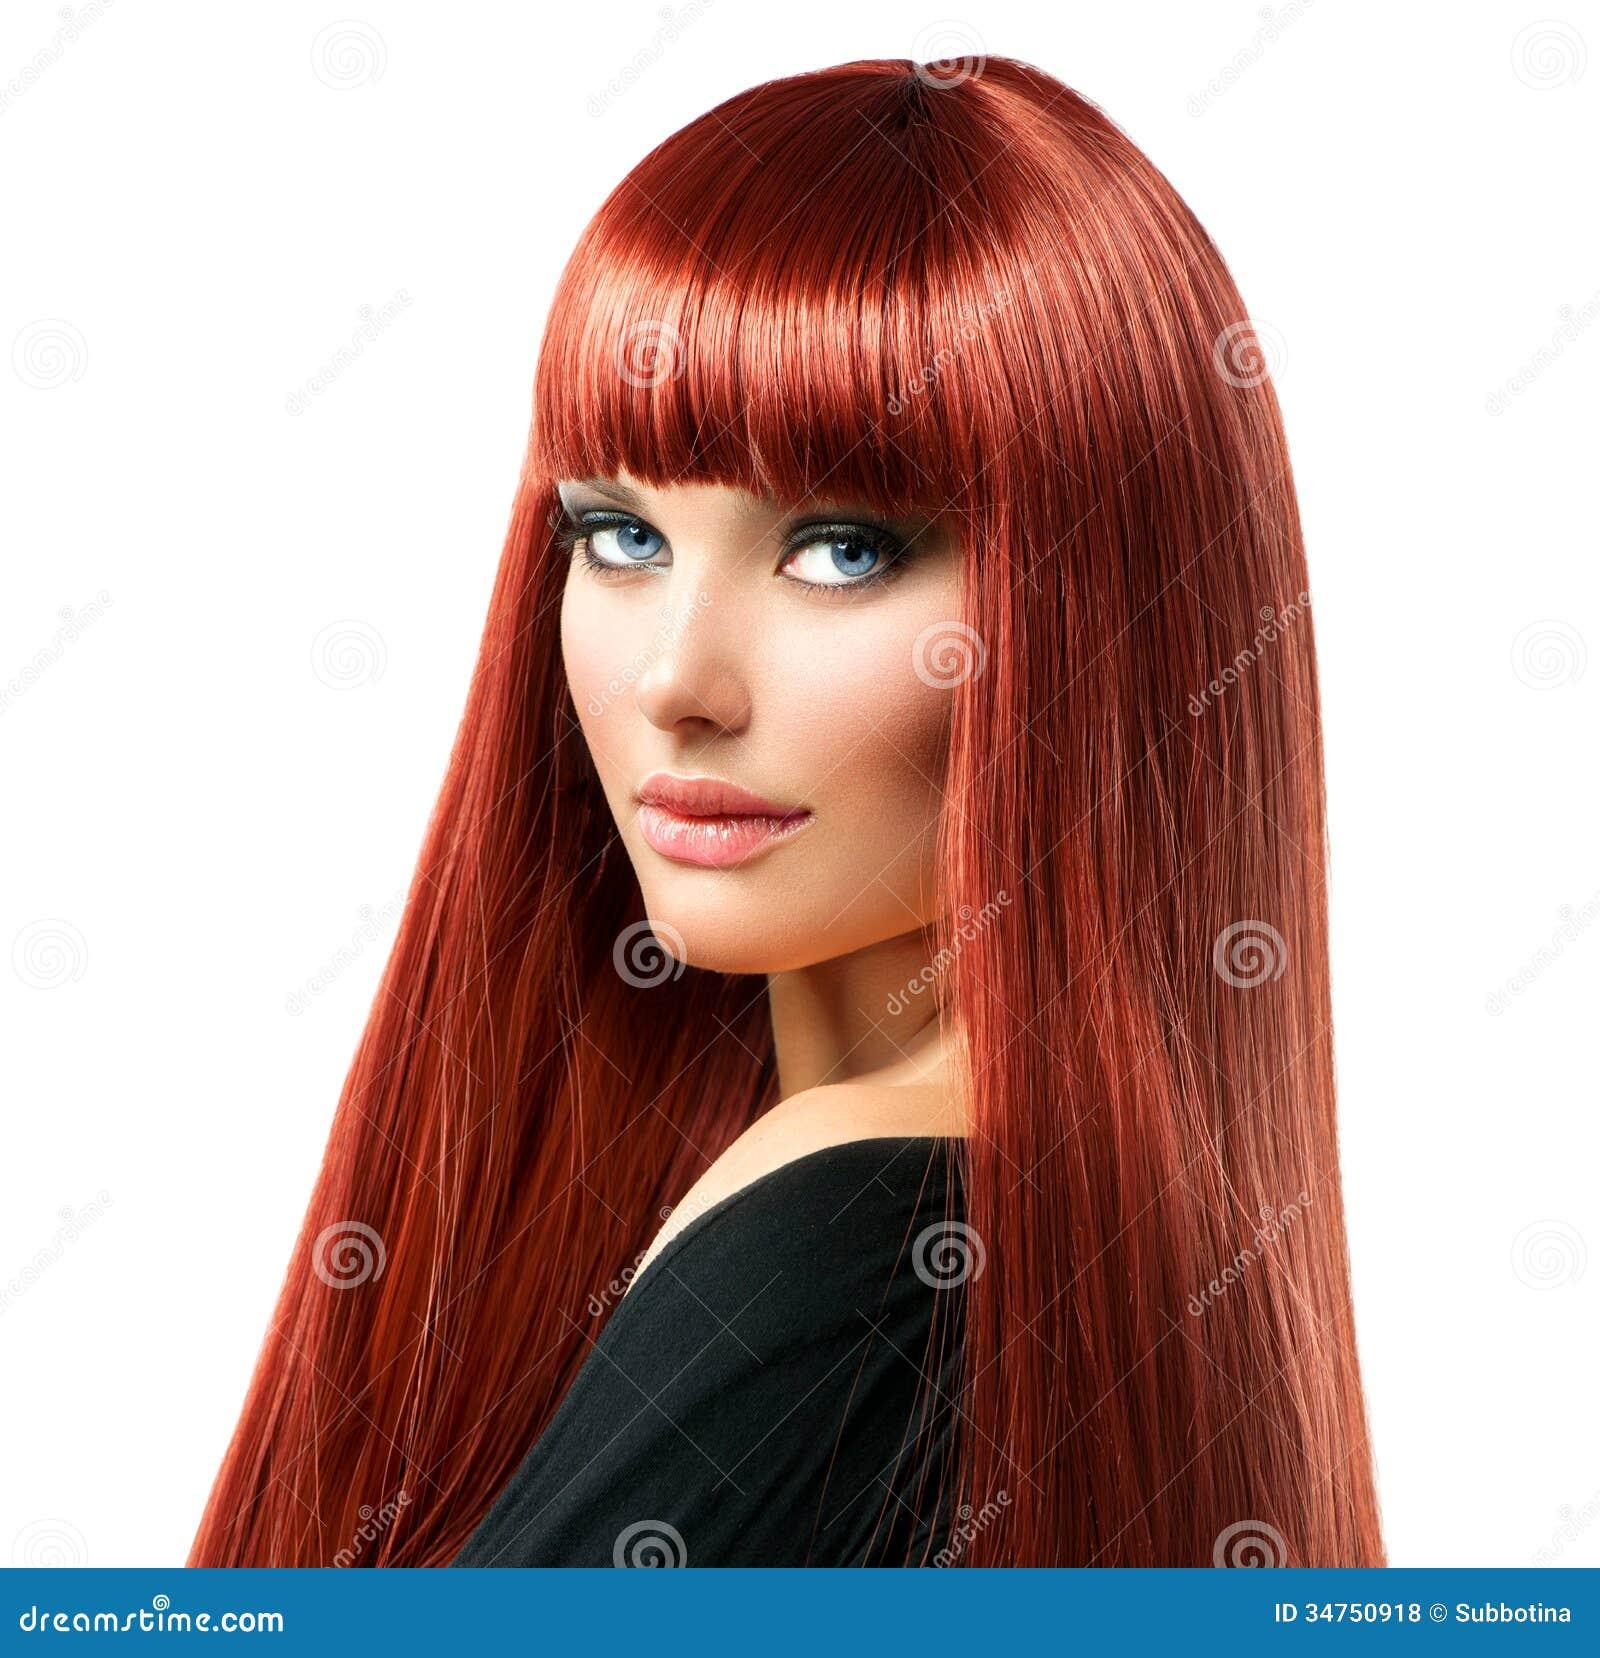 Frau Mit Gelbem Haar: Frau Mit Dem Langen Roten Haar Stockfoto